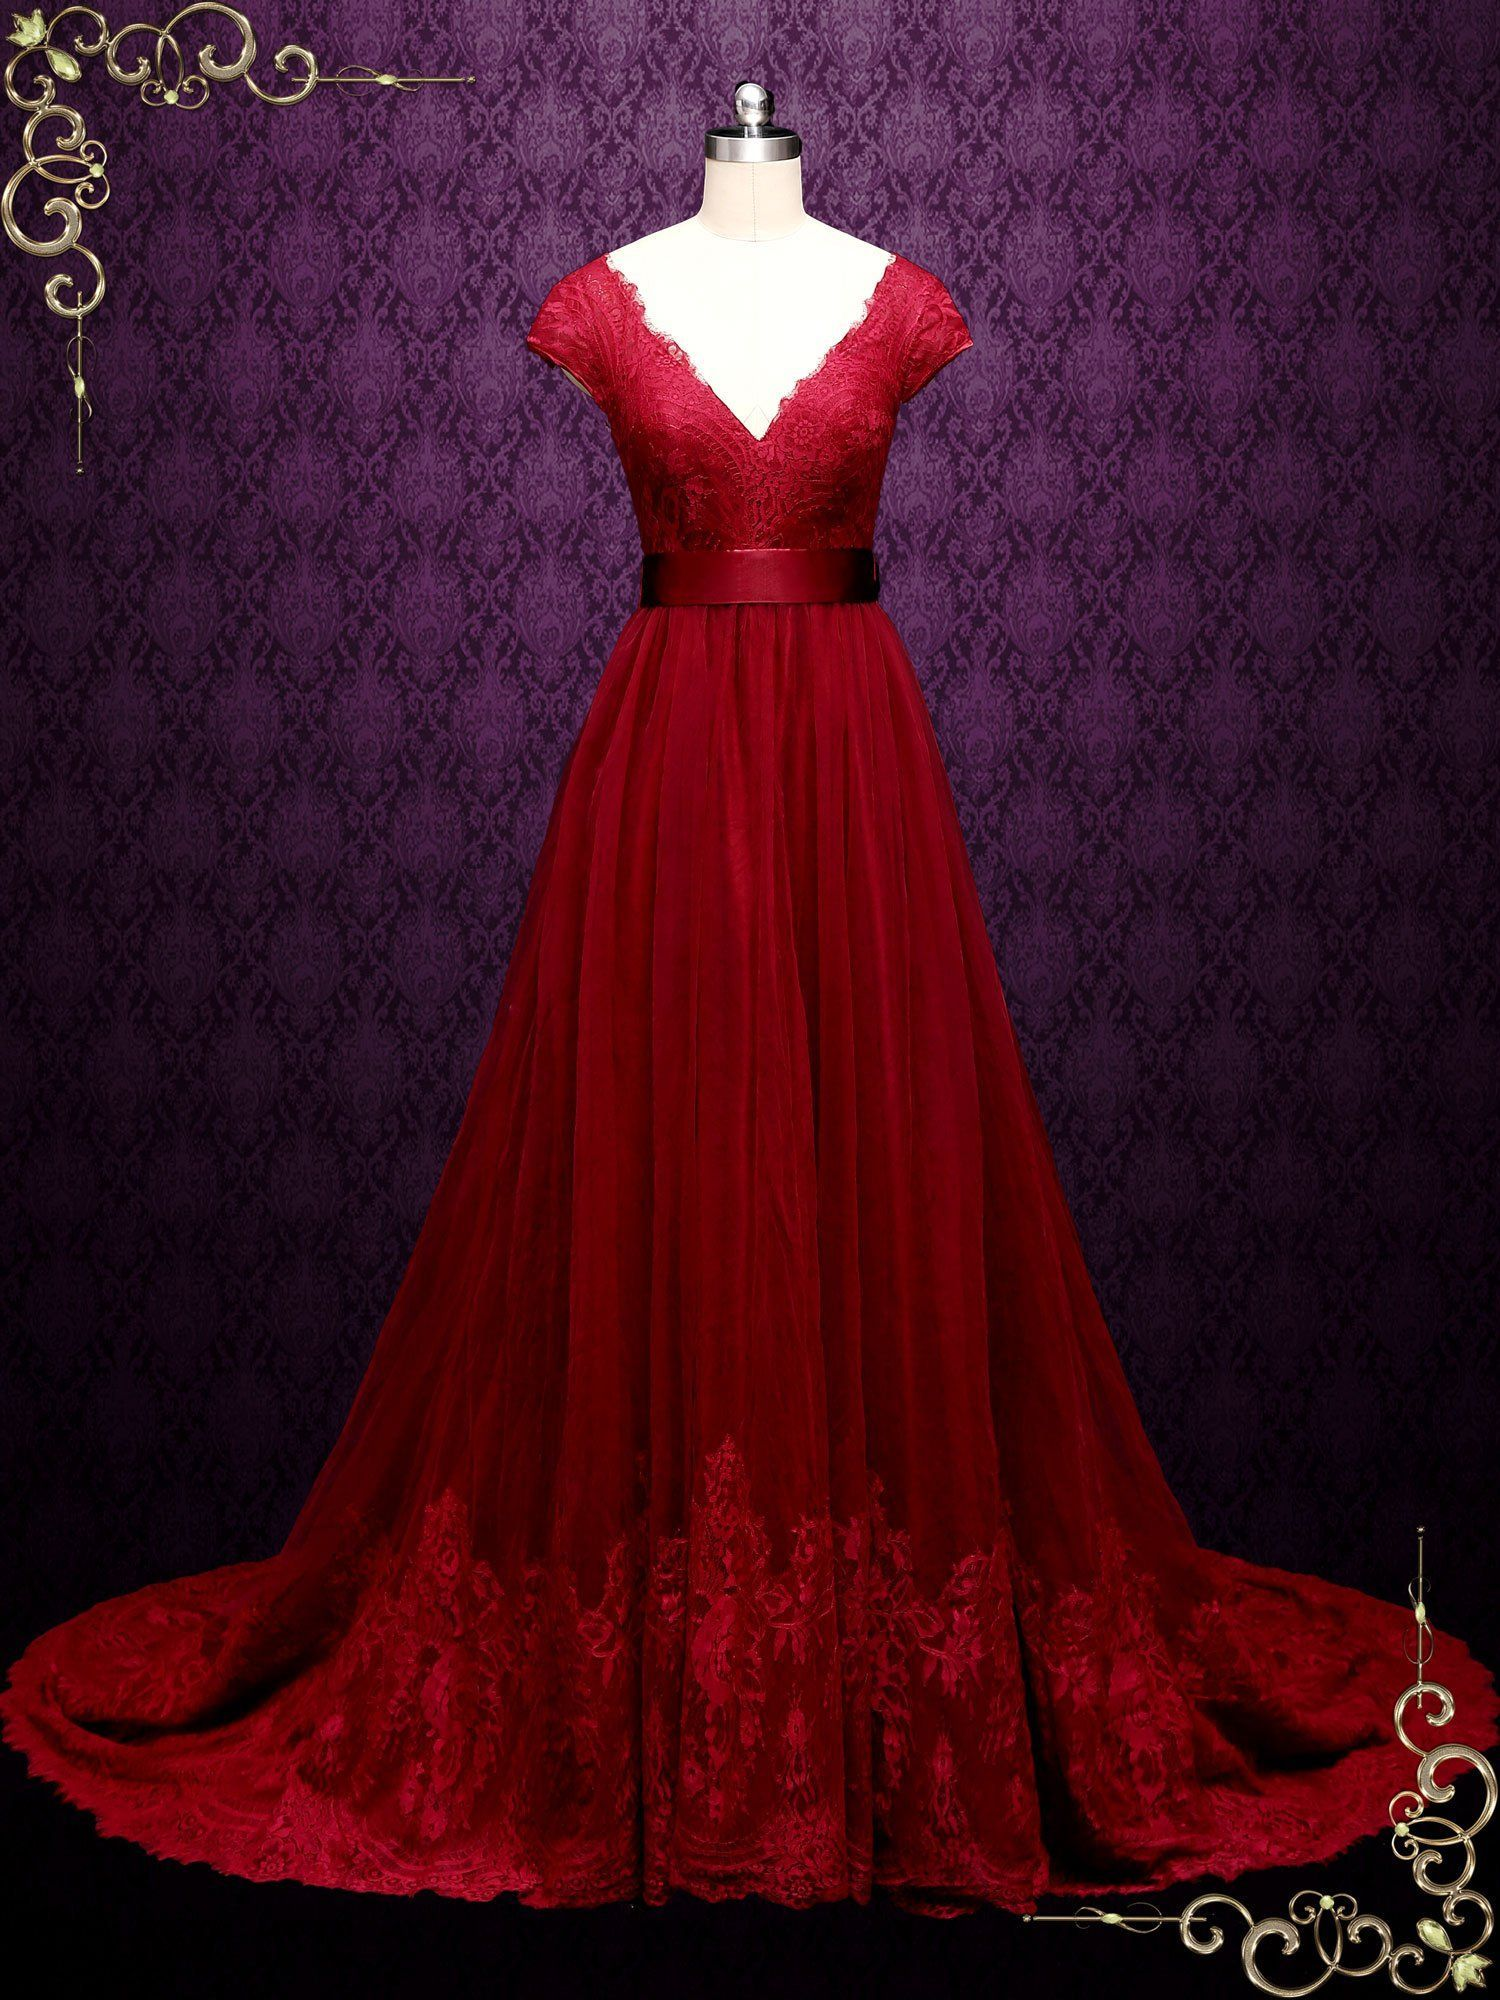 Burgundy Lace A Line Wedding Dress With Short Sleeves Linden Ieie Wedding Dress Styles Chart A Line Wedding Dress Red Wedding Dresses [ 2000 x 1500 Pixel ]